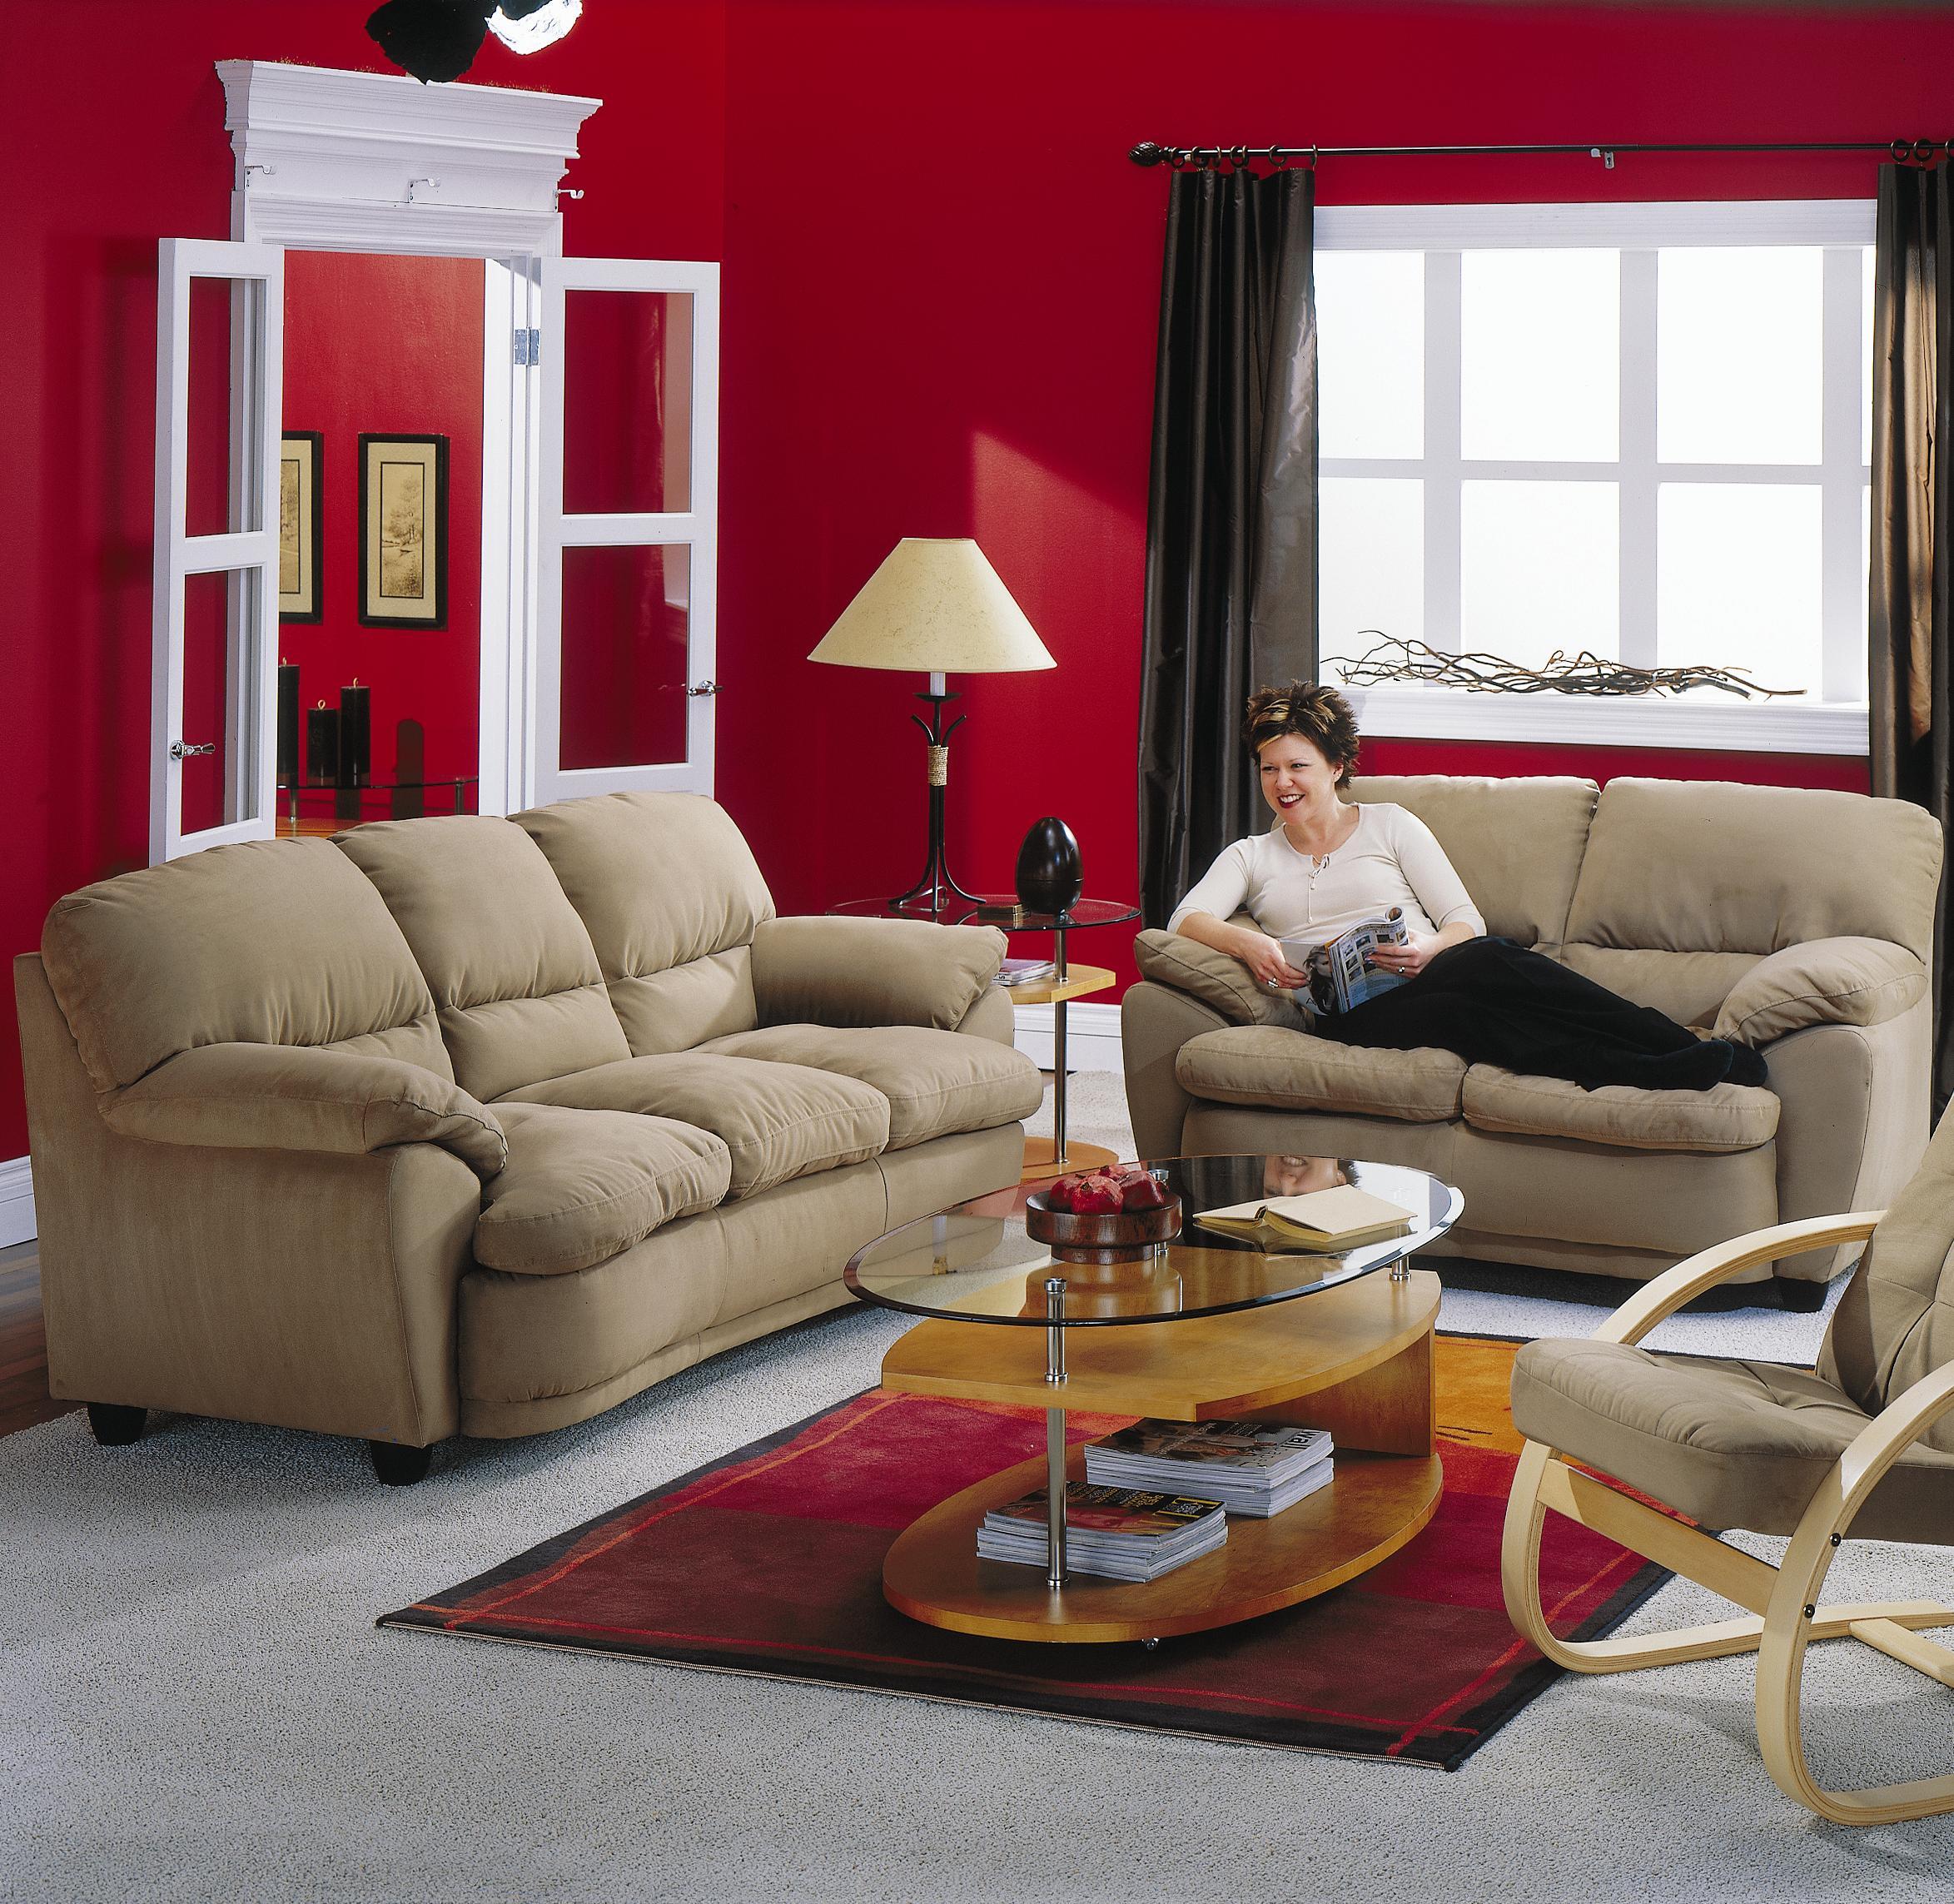 palliser stationary sofas corner sofa cheap harley living room group belfort furniture